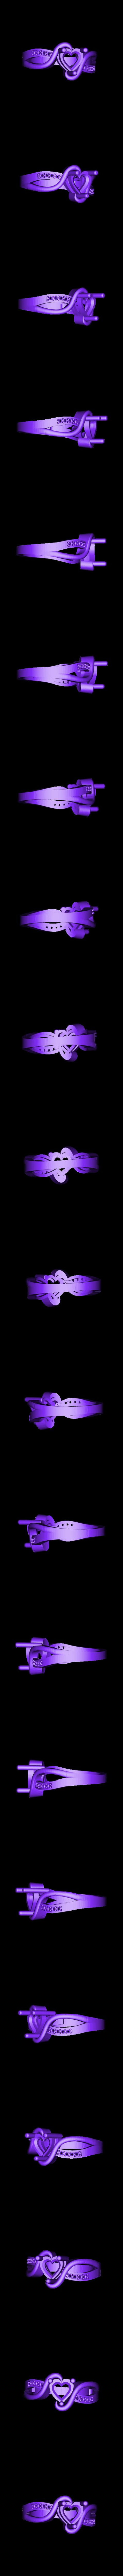 RG27560.stl Download STL file Womens Special Heart Ring 3D CAD Design In STL Format • 3D print template, VR3D